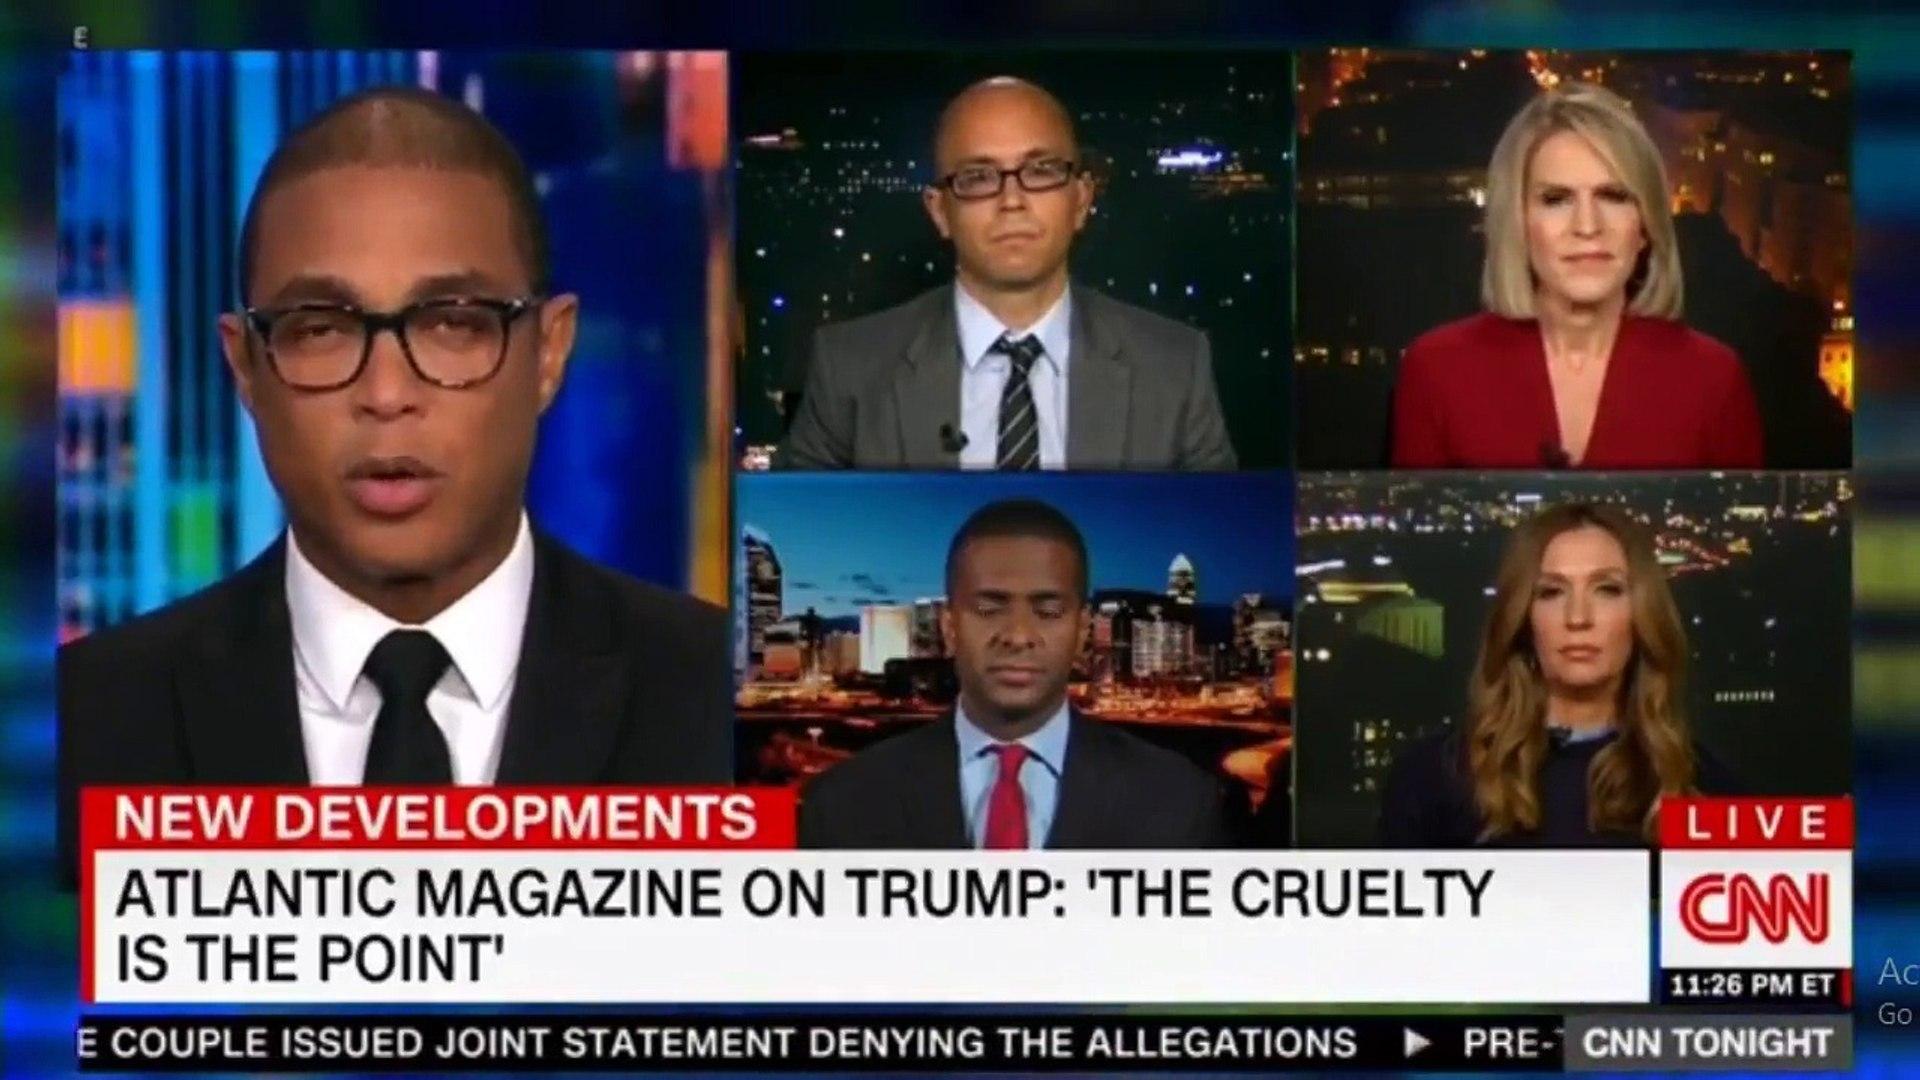 CNN Tonight Live  Don Lemon 10-17-2018  CNN Breaking News Today OCt 17, 2018